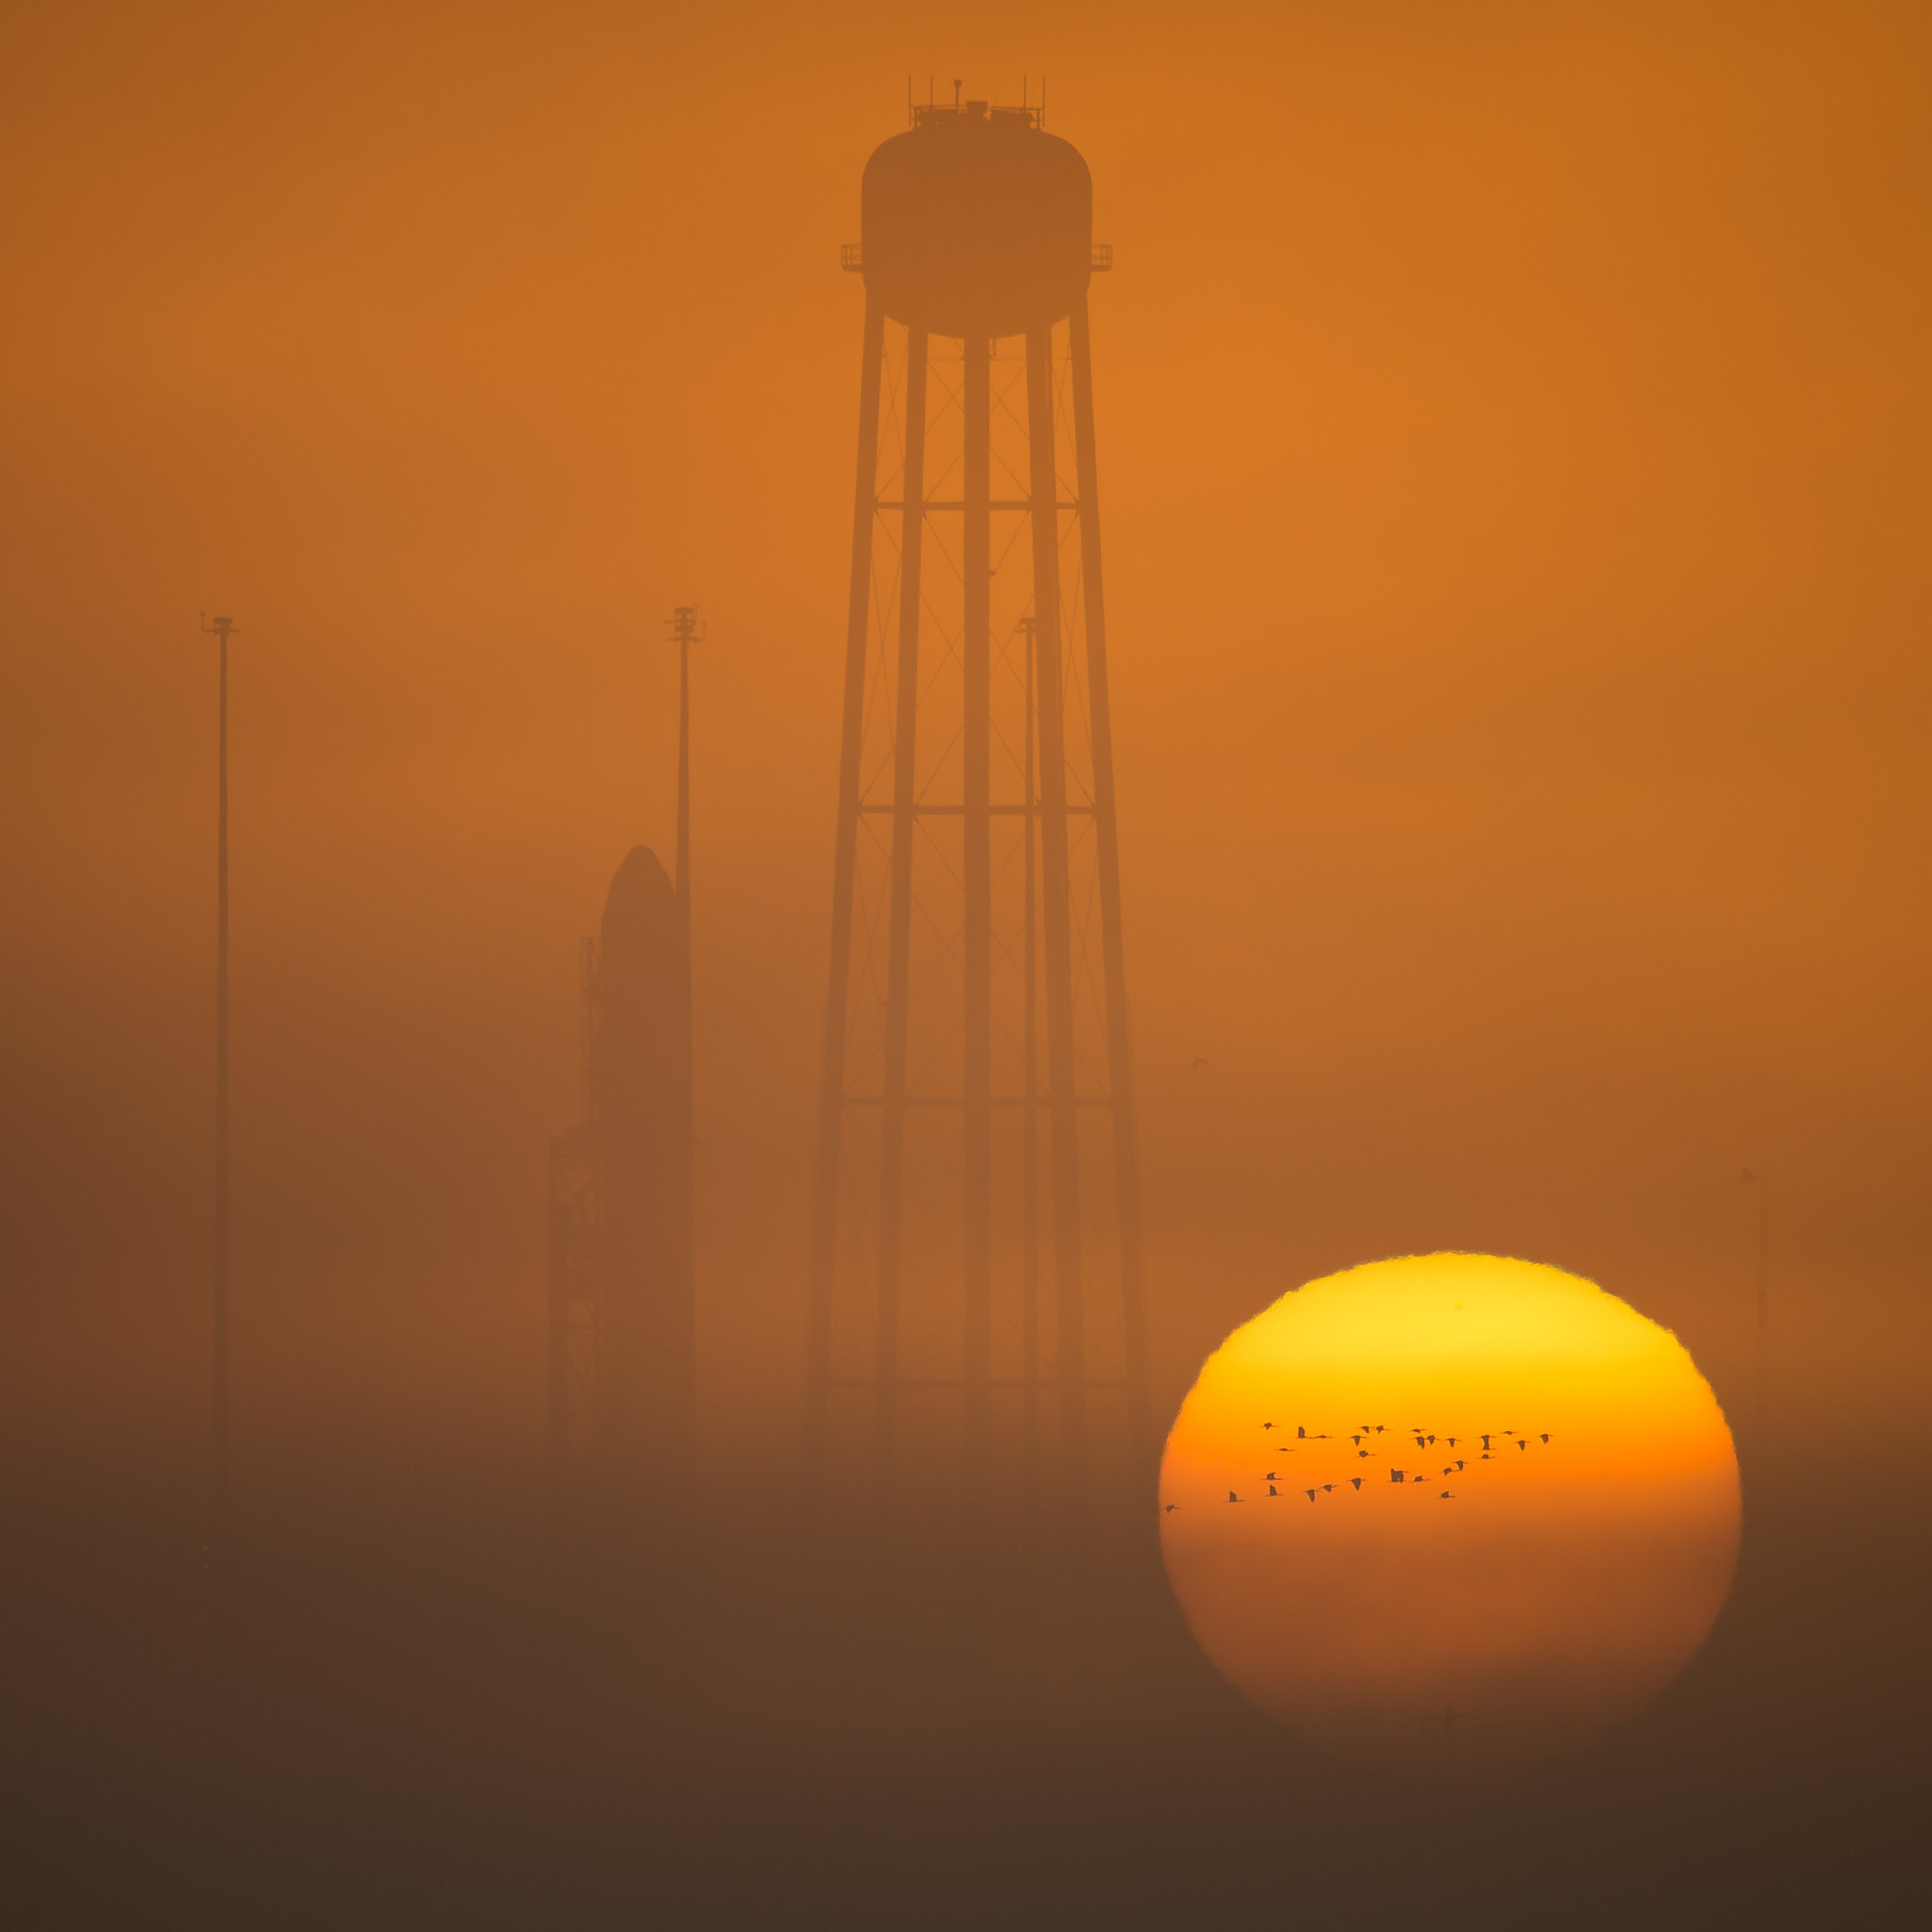 Antares Rocket Prelaunch (NHQ201610160100)